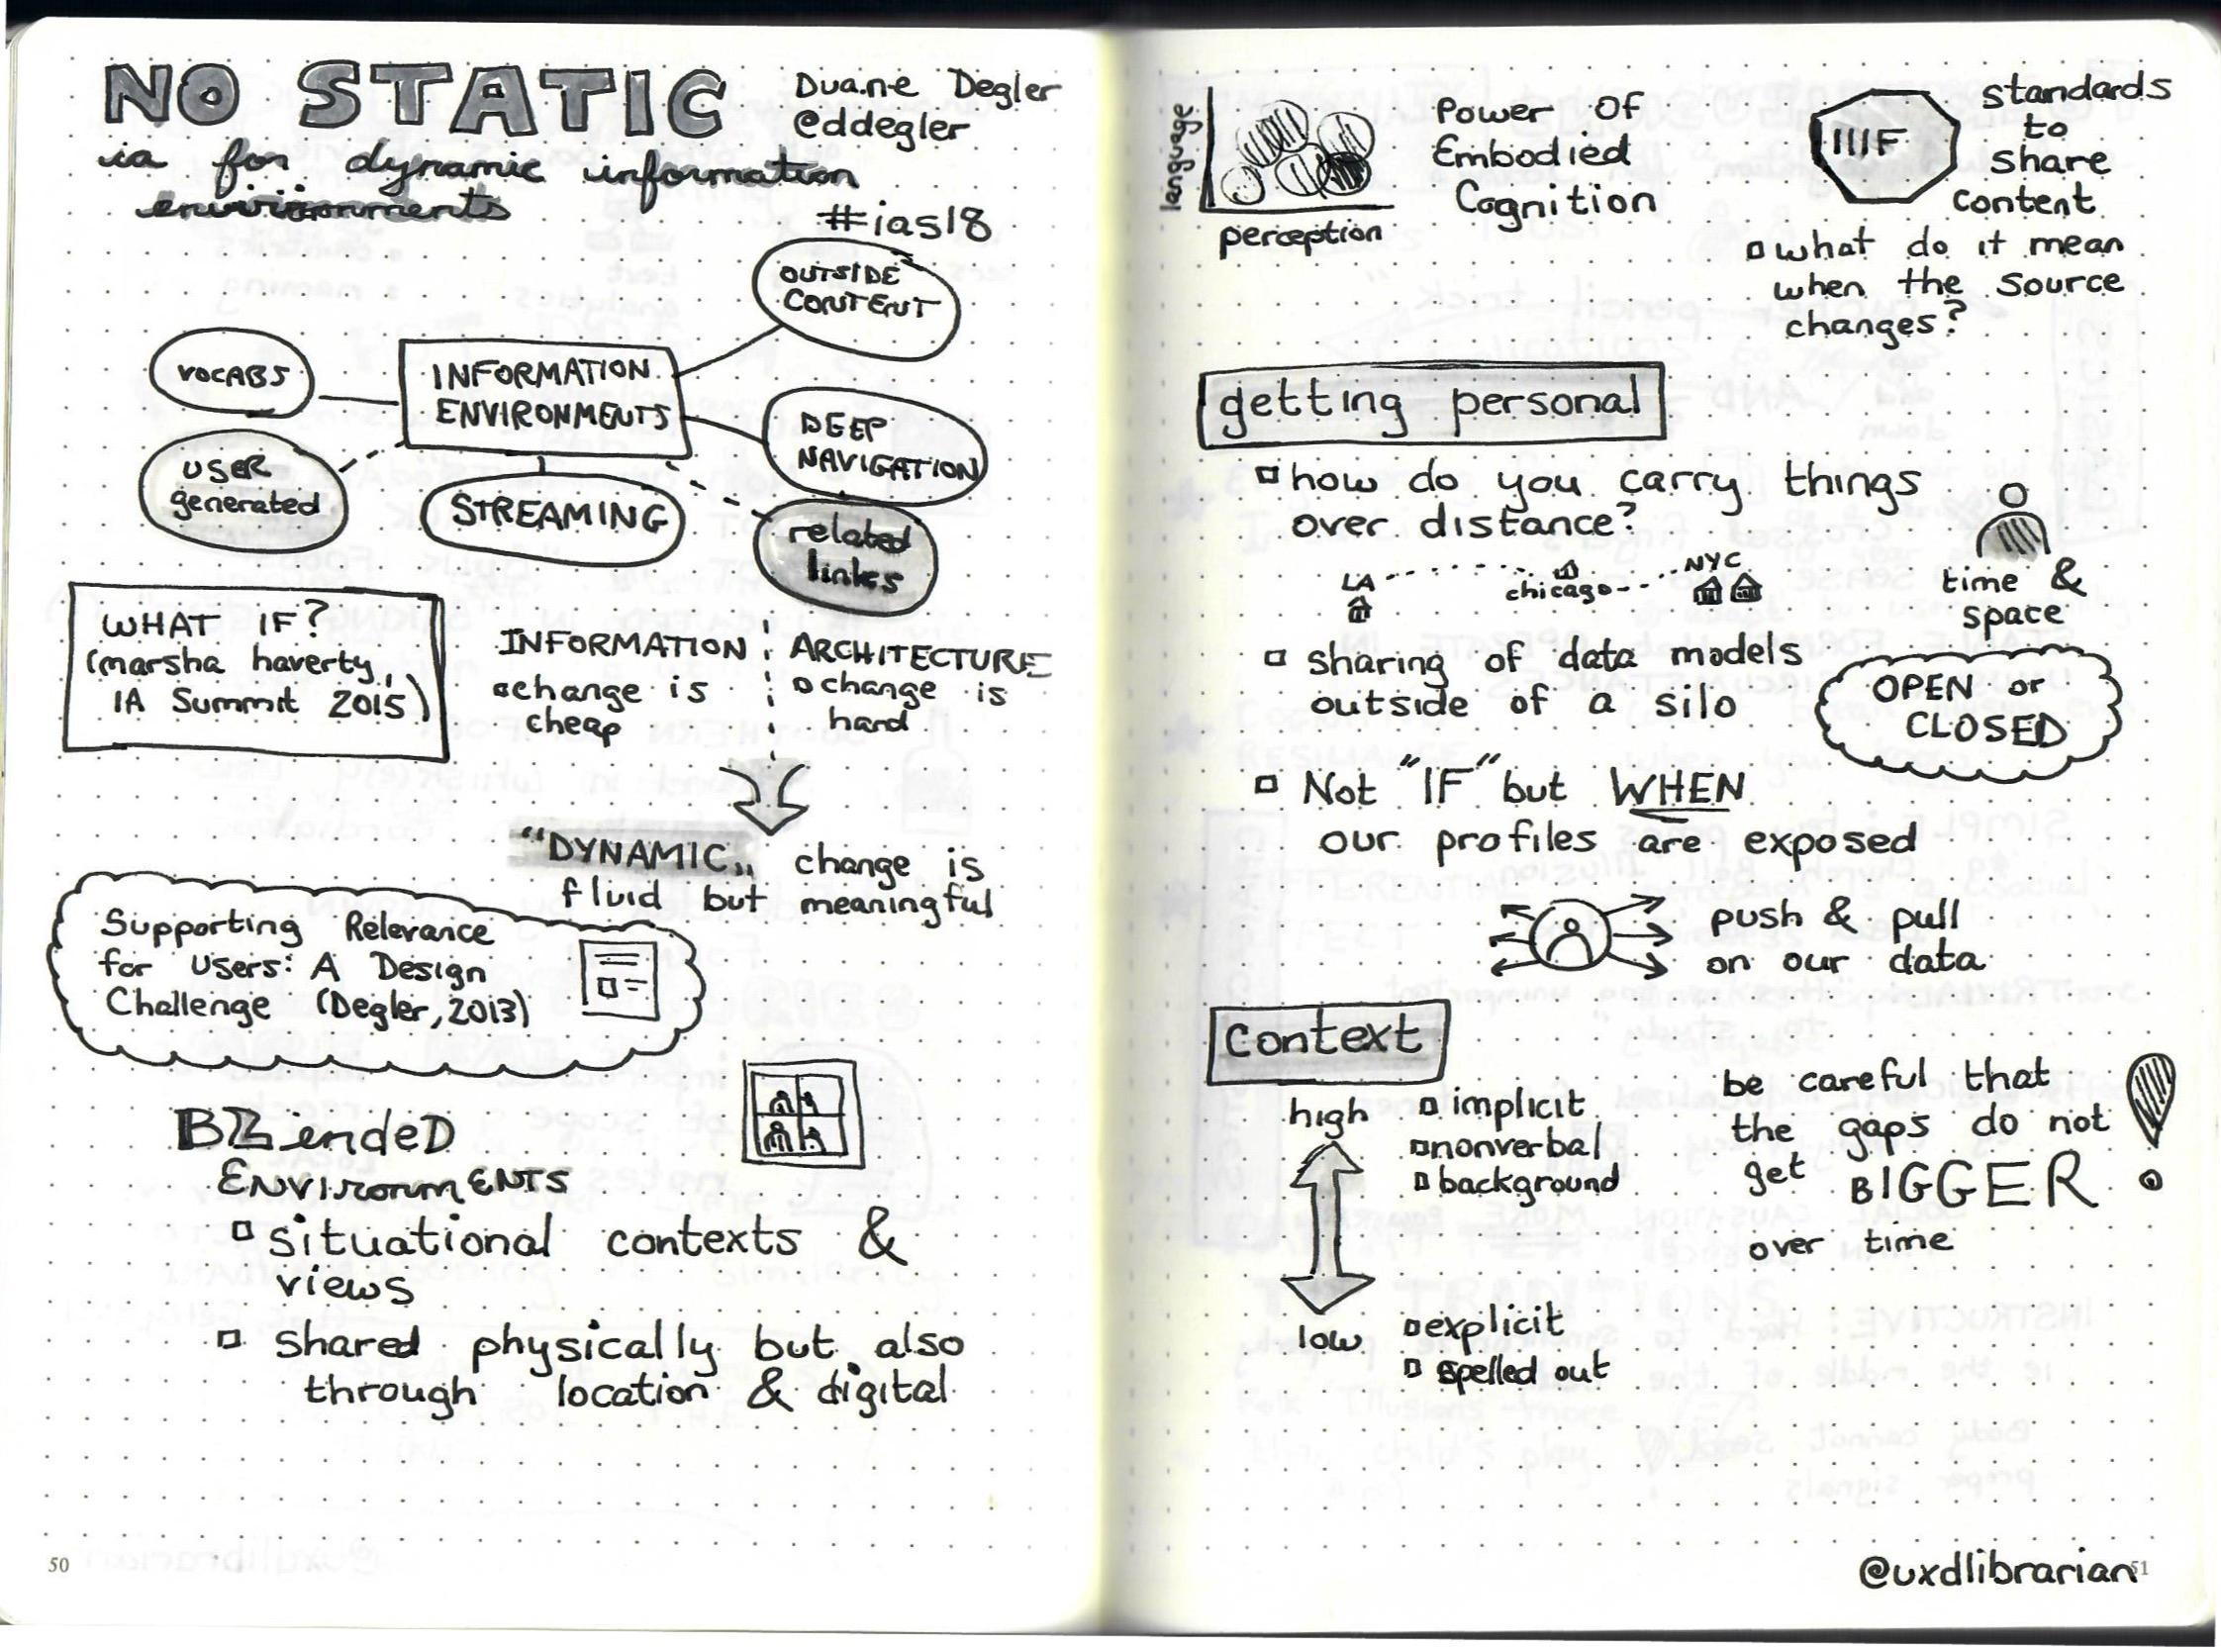 No Static IA for Dynamic Information Environments (Duane Degler).jpg